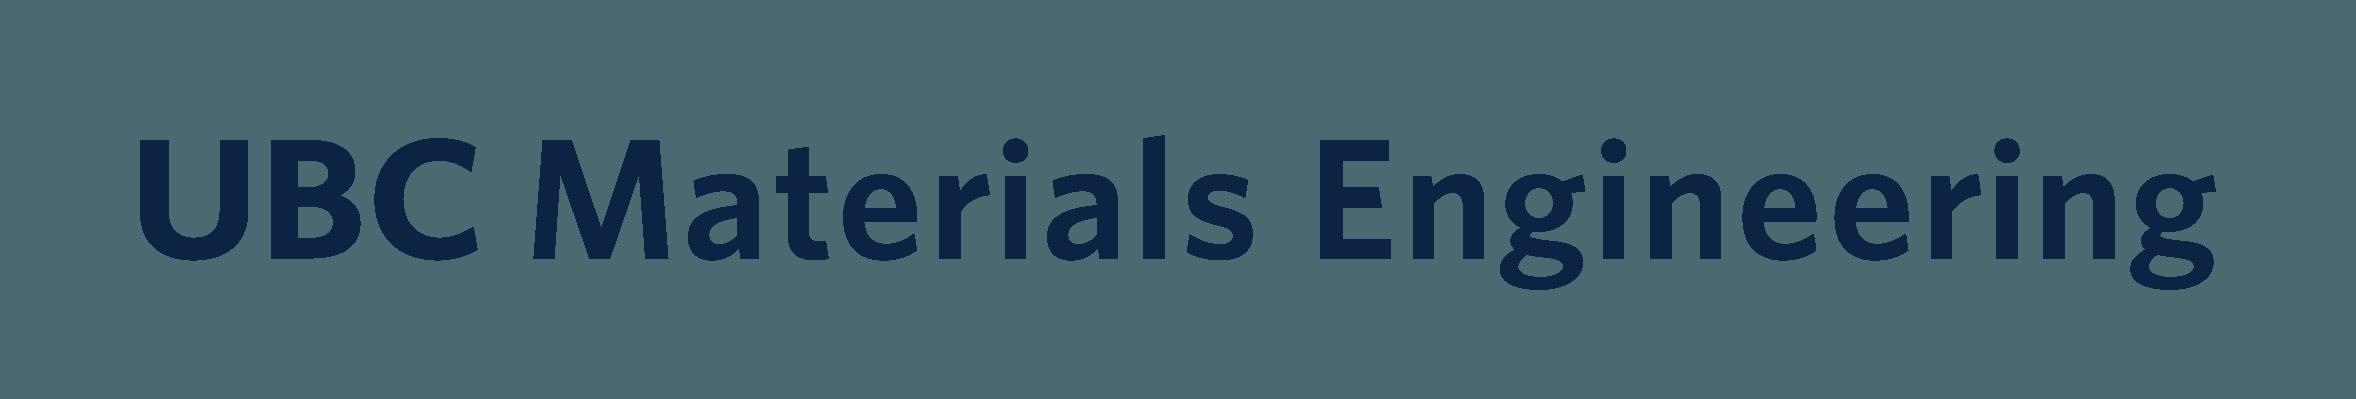 UBC Materials Engineering Logo